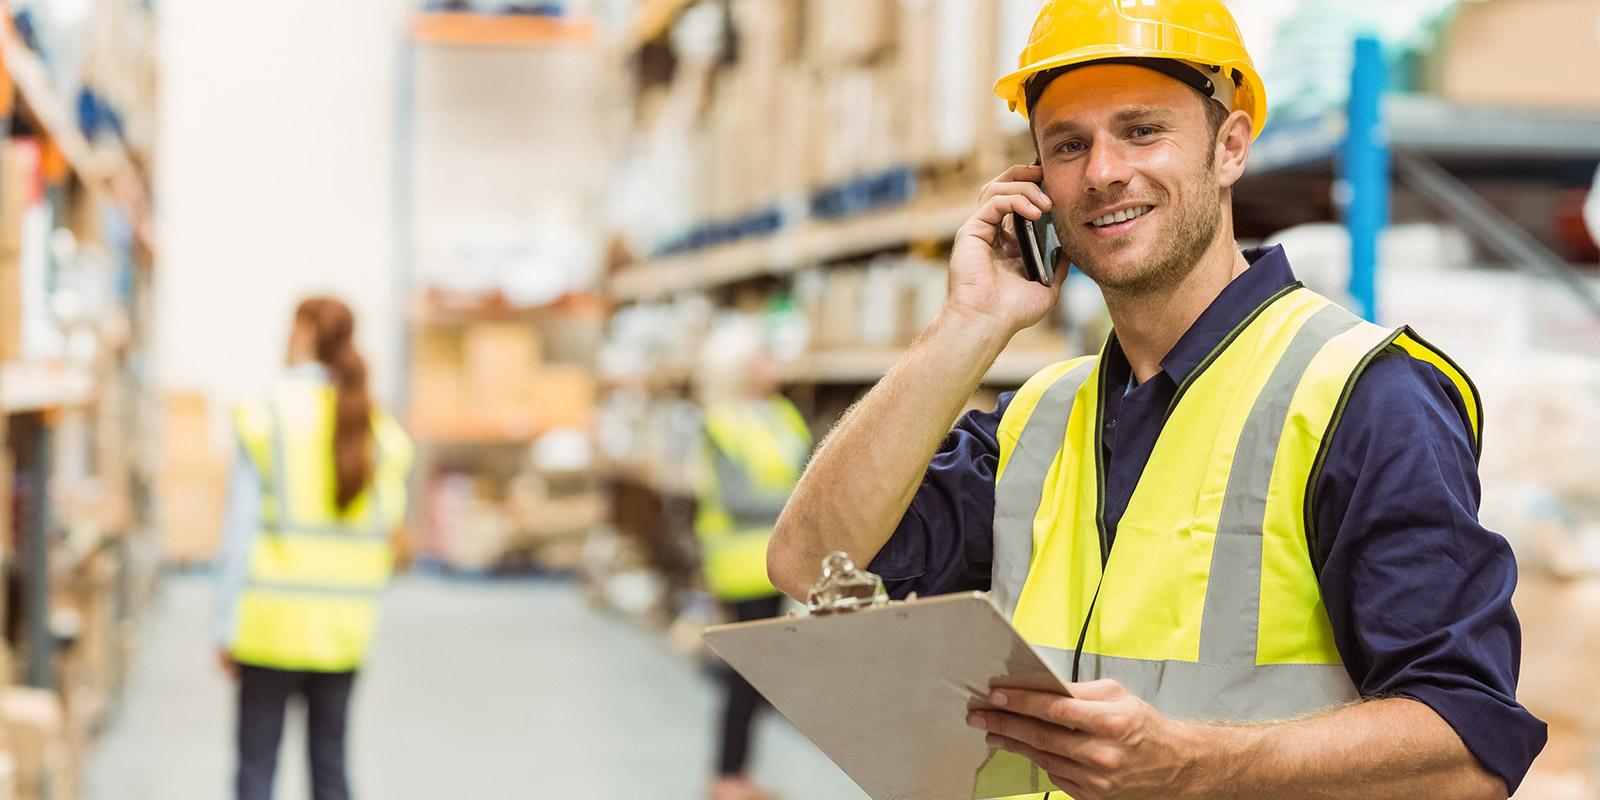 jobposting warehouse worker male